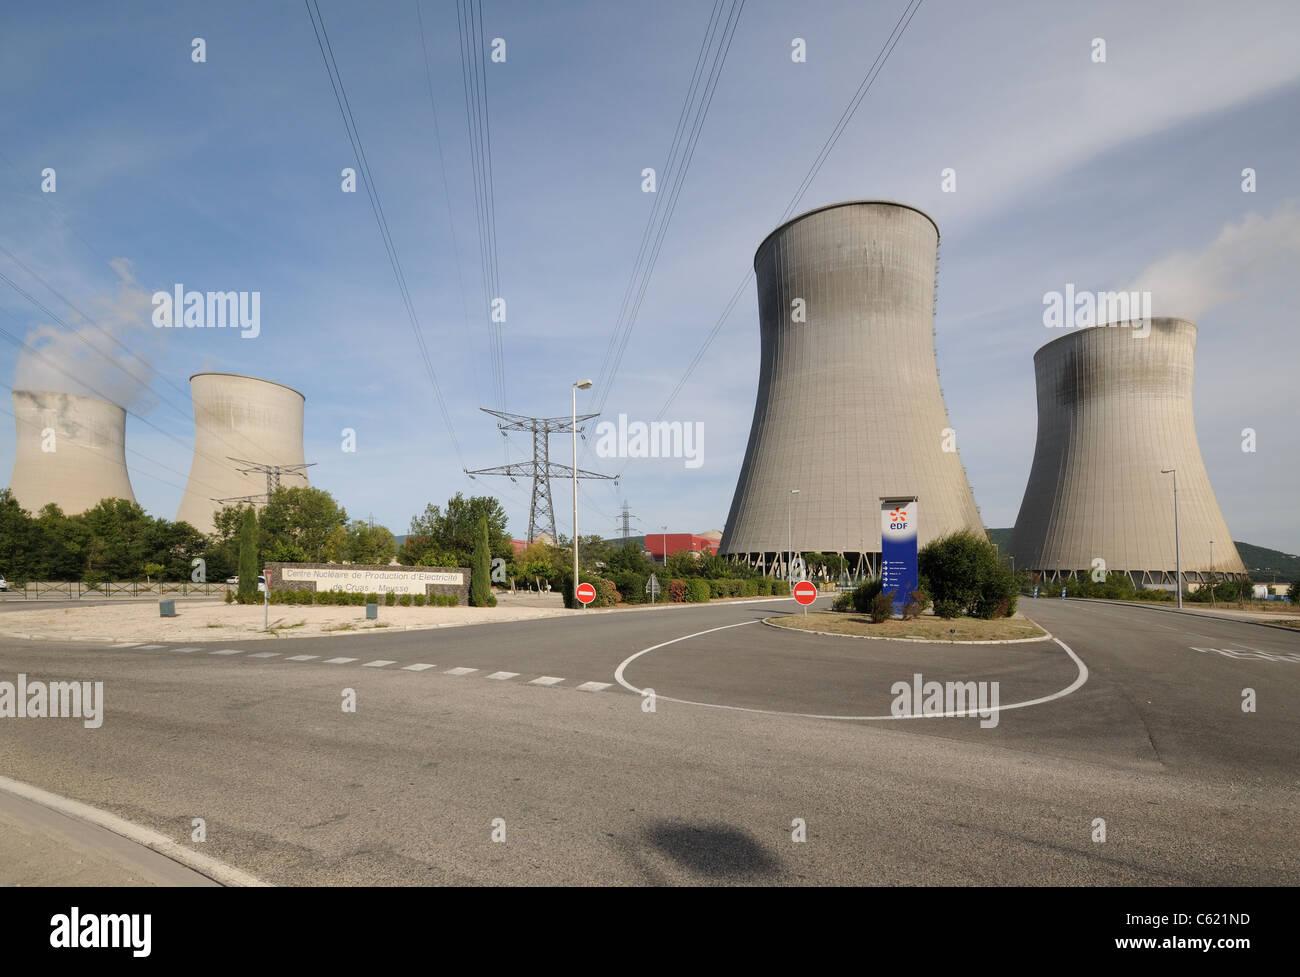 Nuclear power atomic generating station Centre Nucleaire de Production d'Electricite de Cruas Meysse Rhone Valley - Stock Image